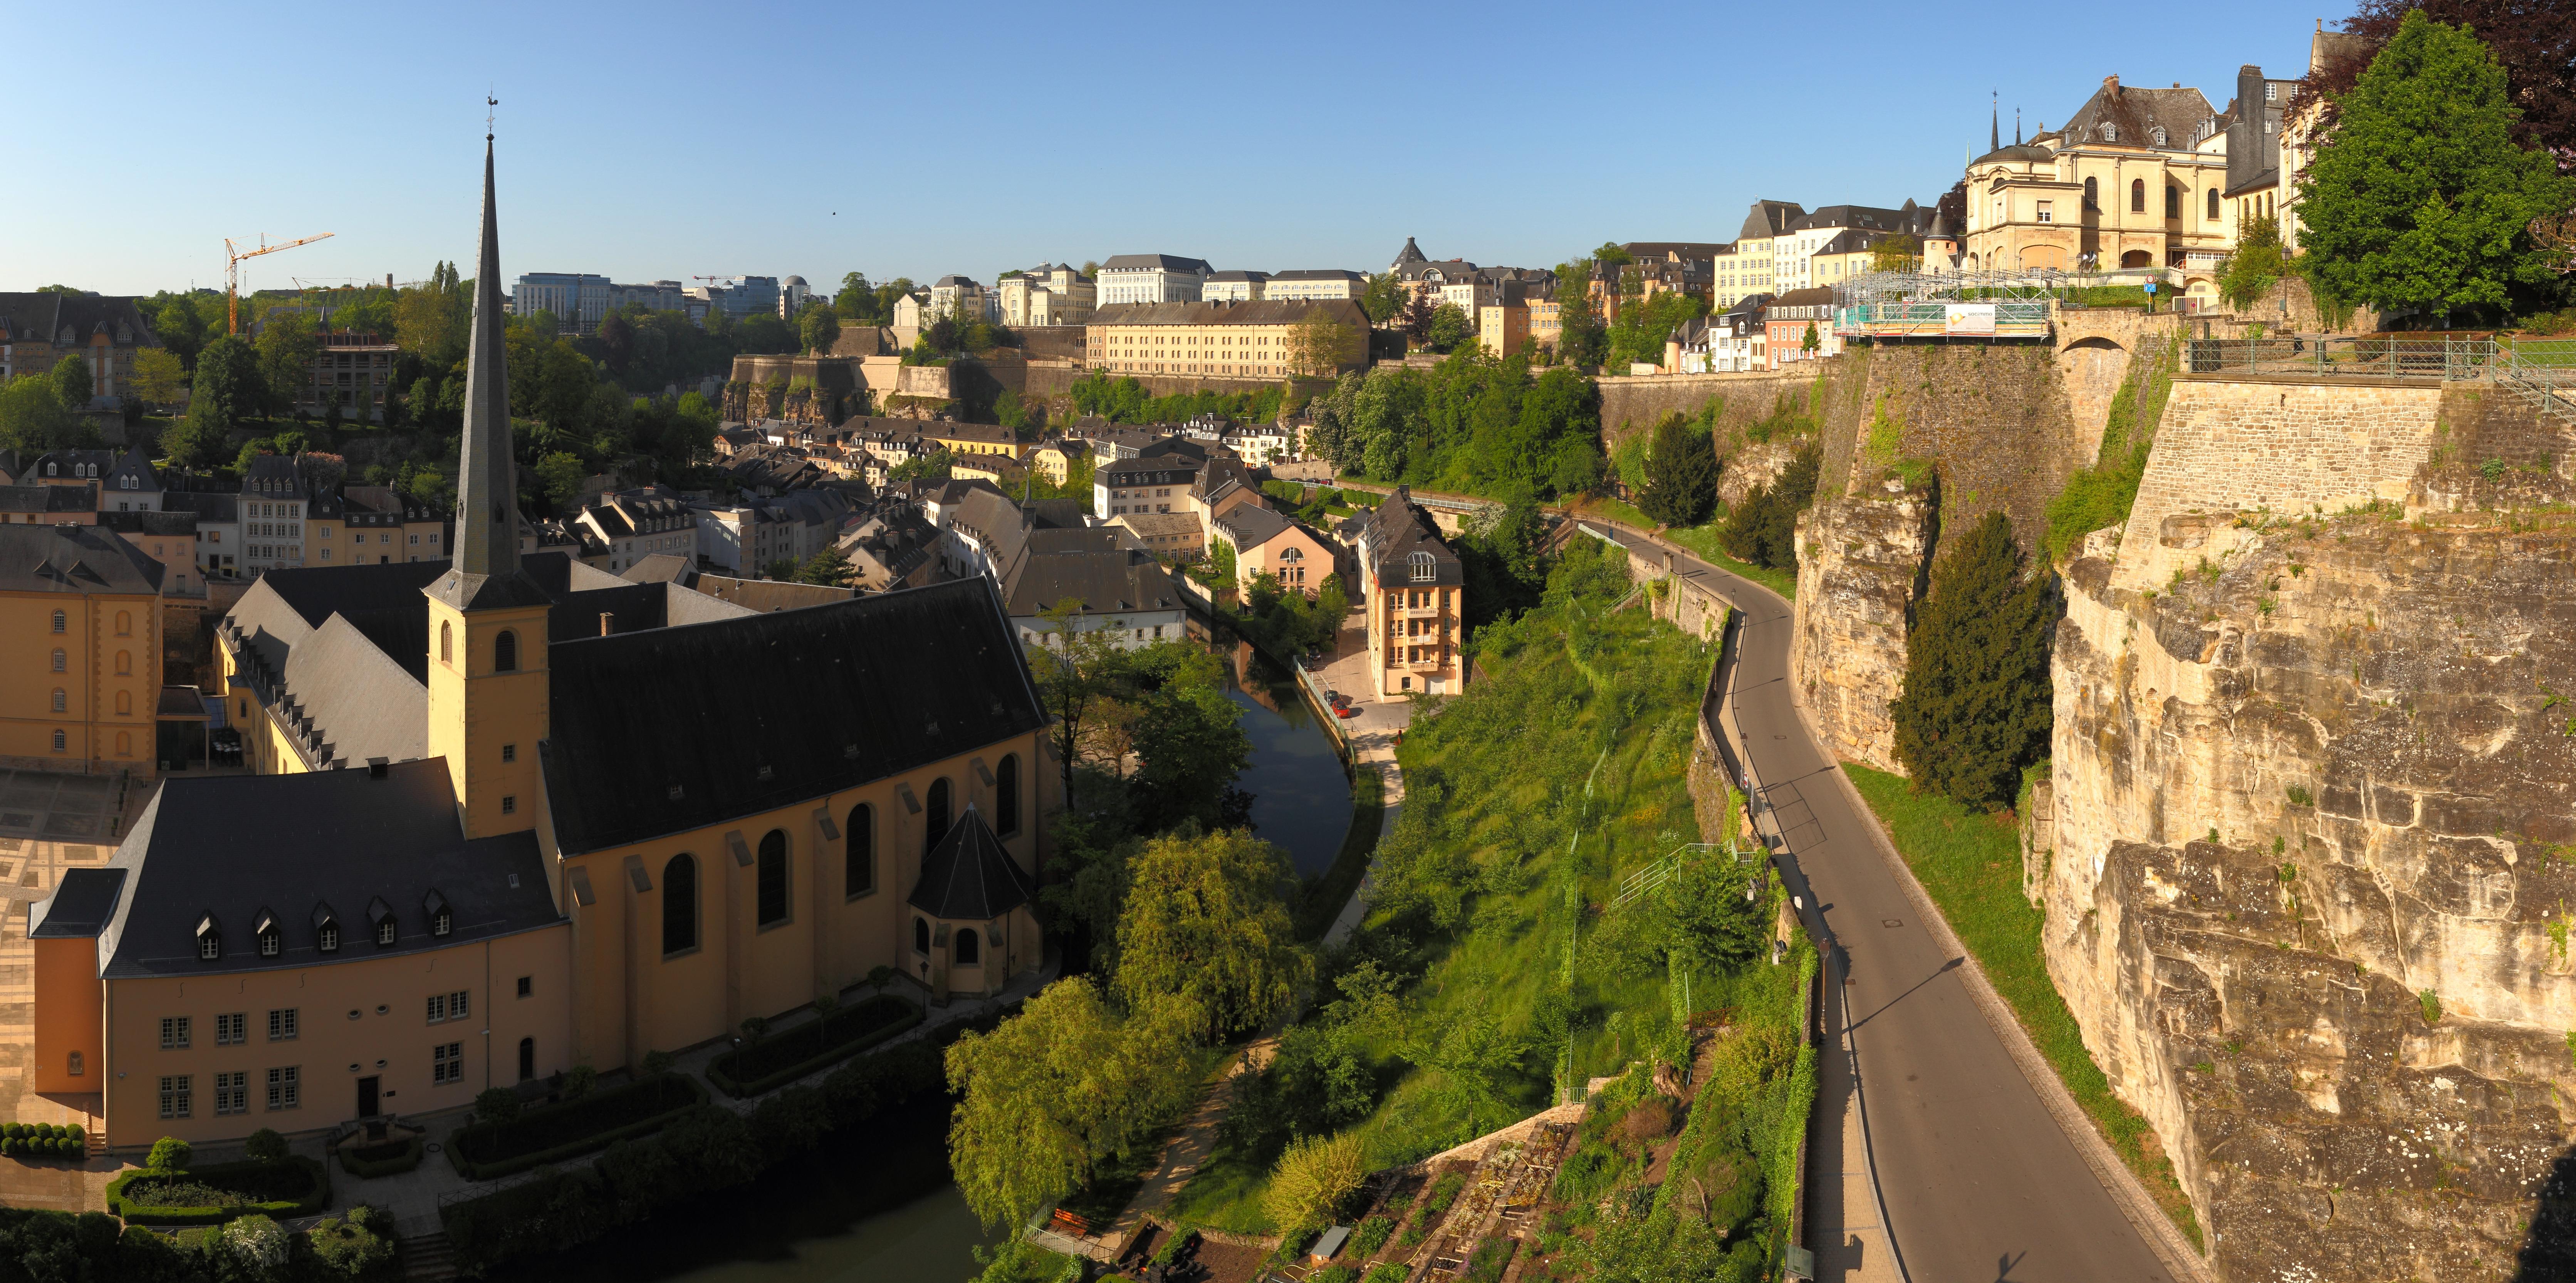 Beste reistijd Luxemburg